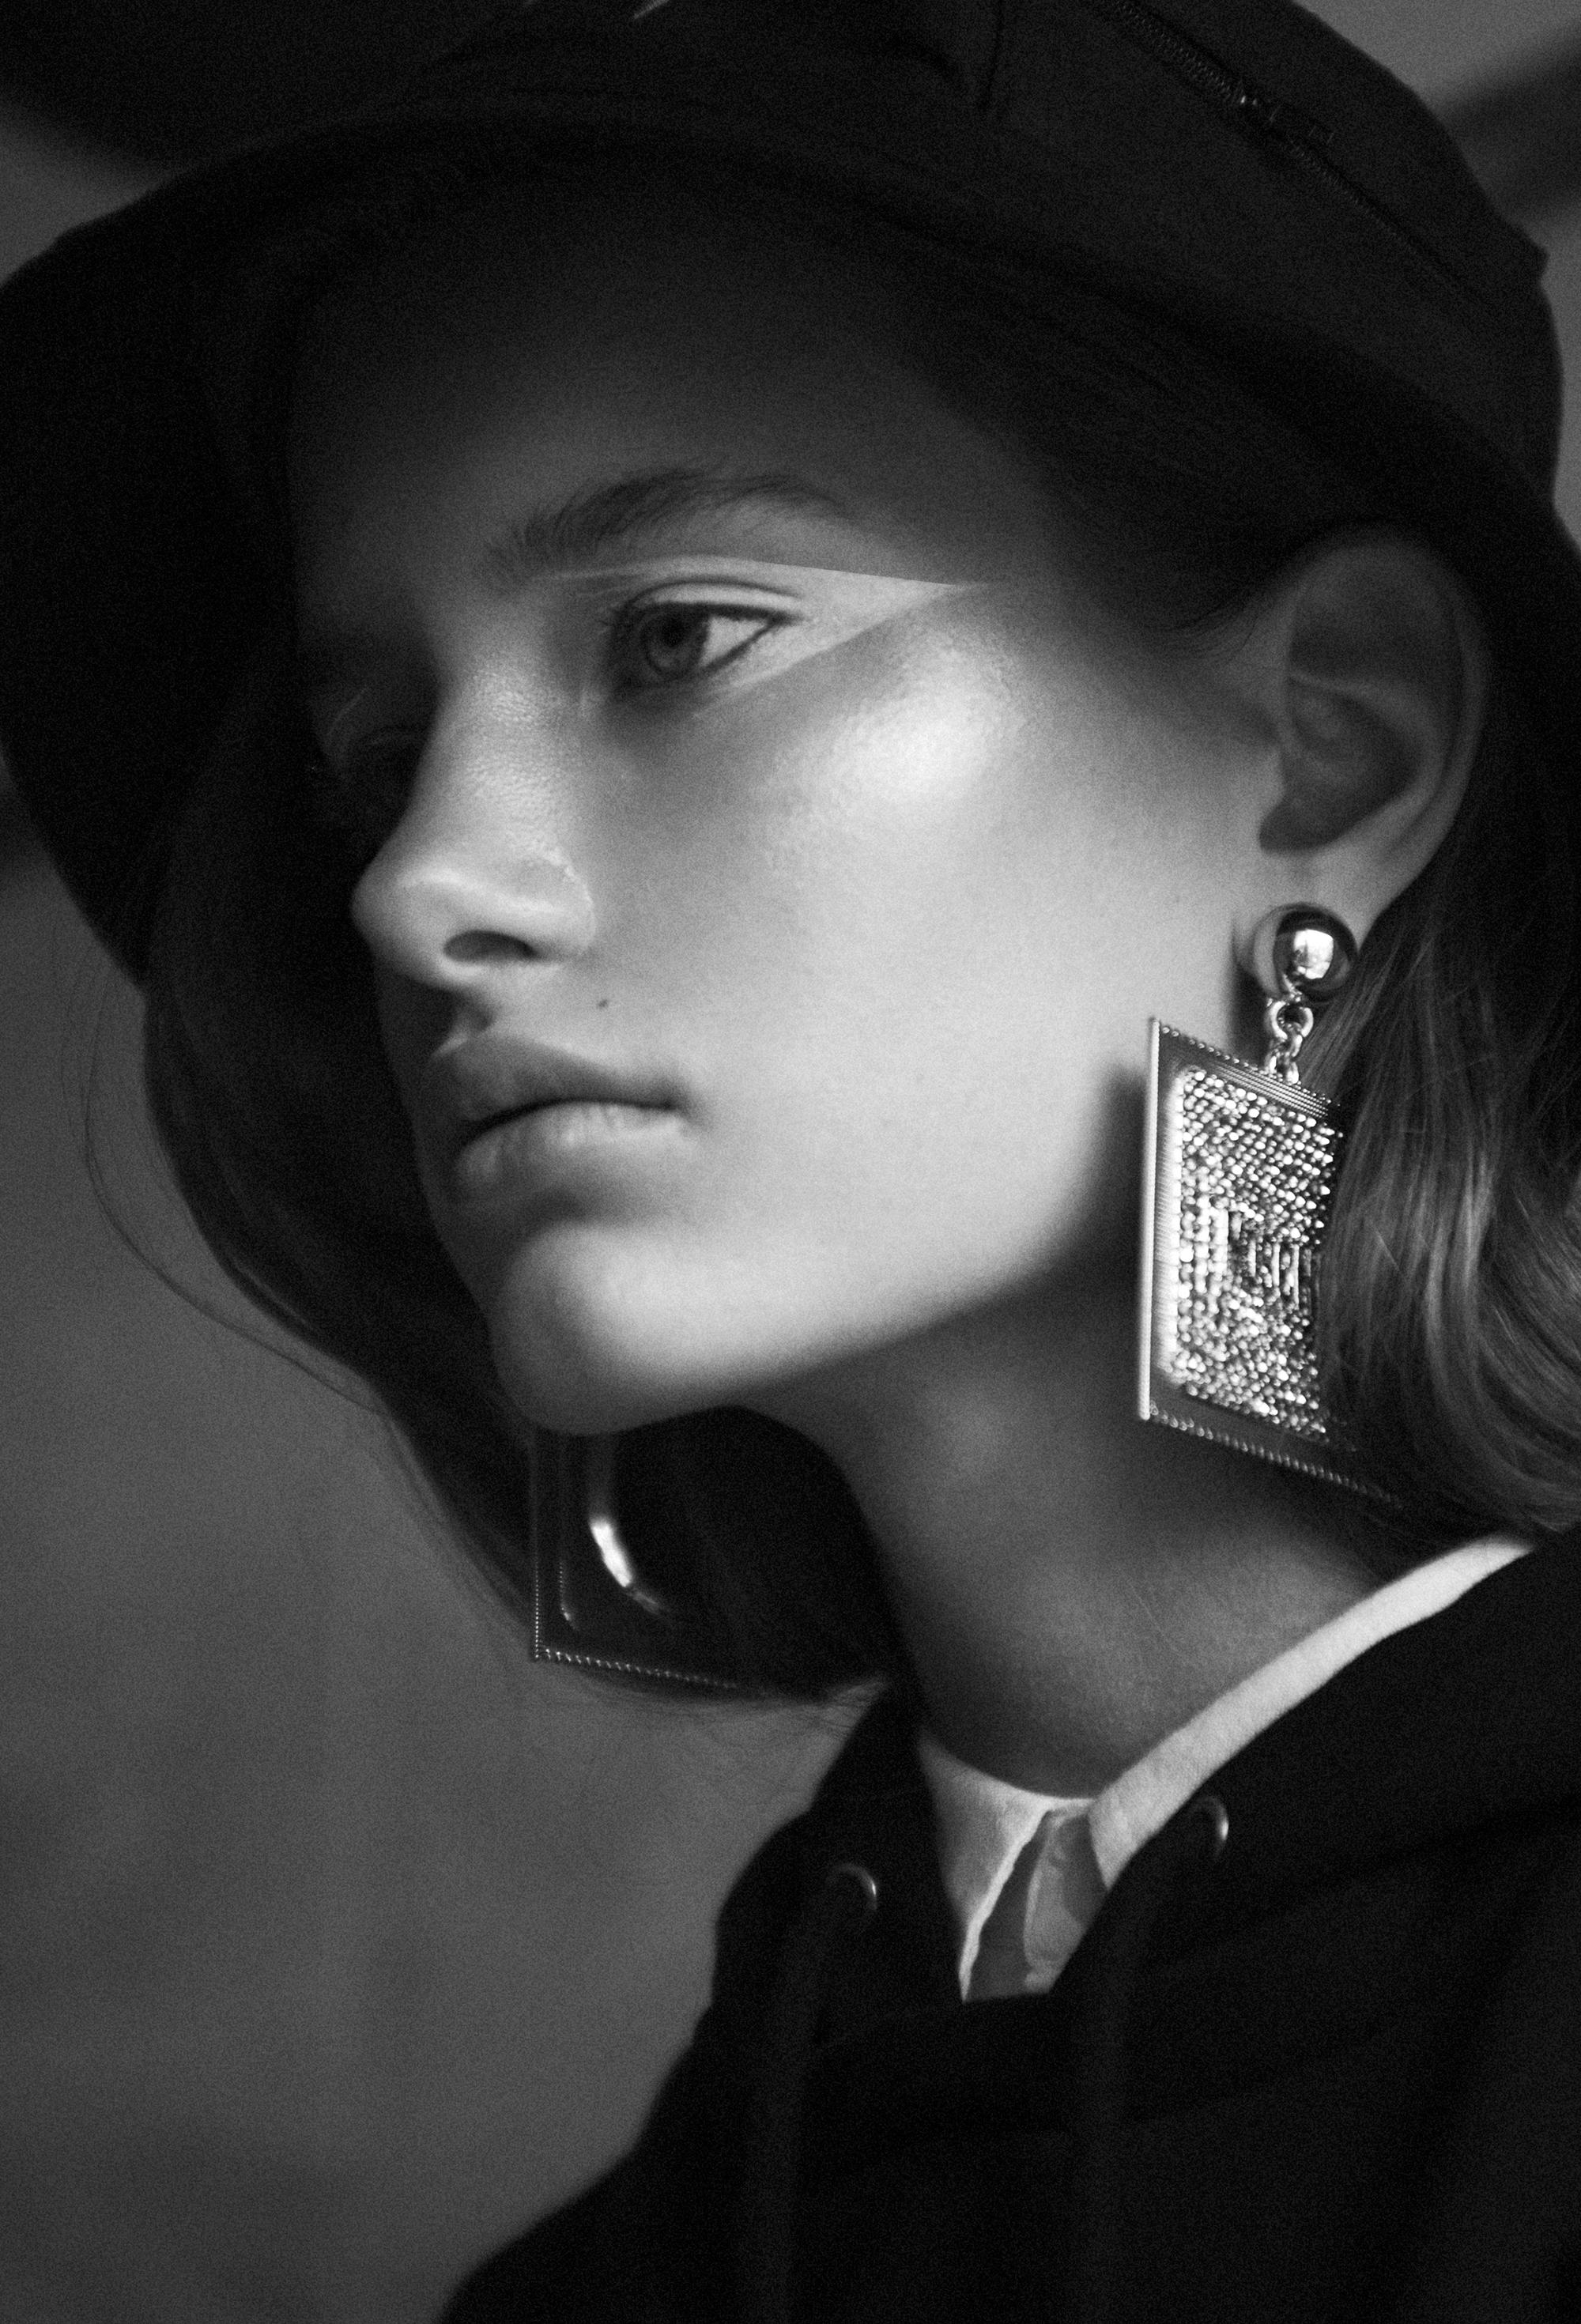 Bucker Hat  Prada.  Jumper  Balenciaga . White shirt  Acne Studios . Earrings  Moschino X H&M